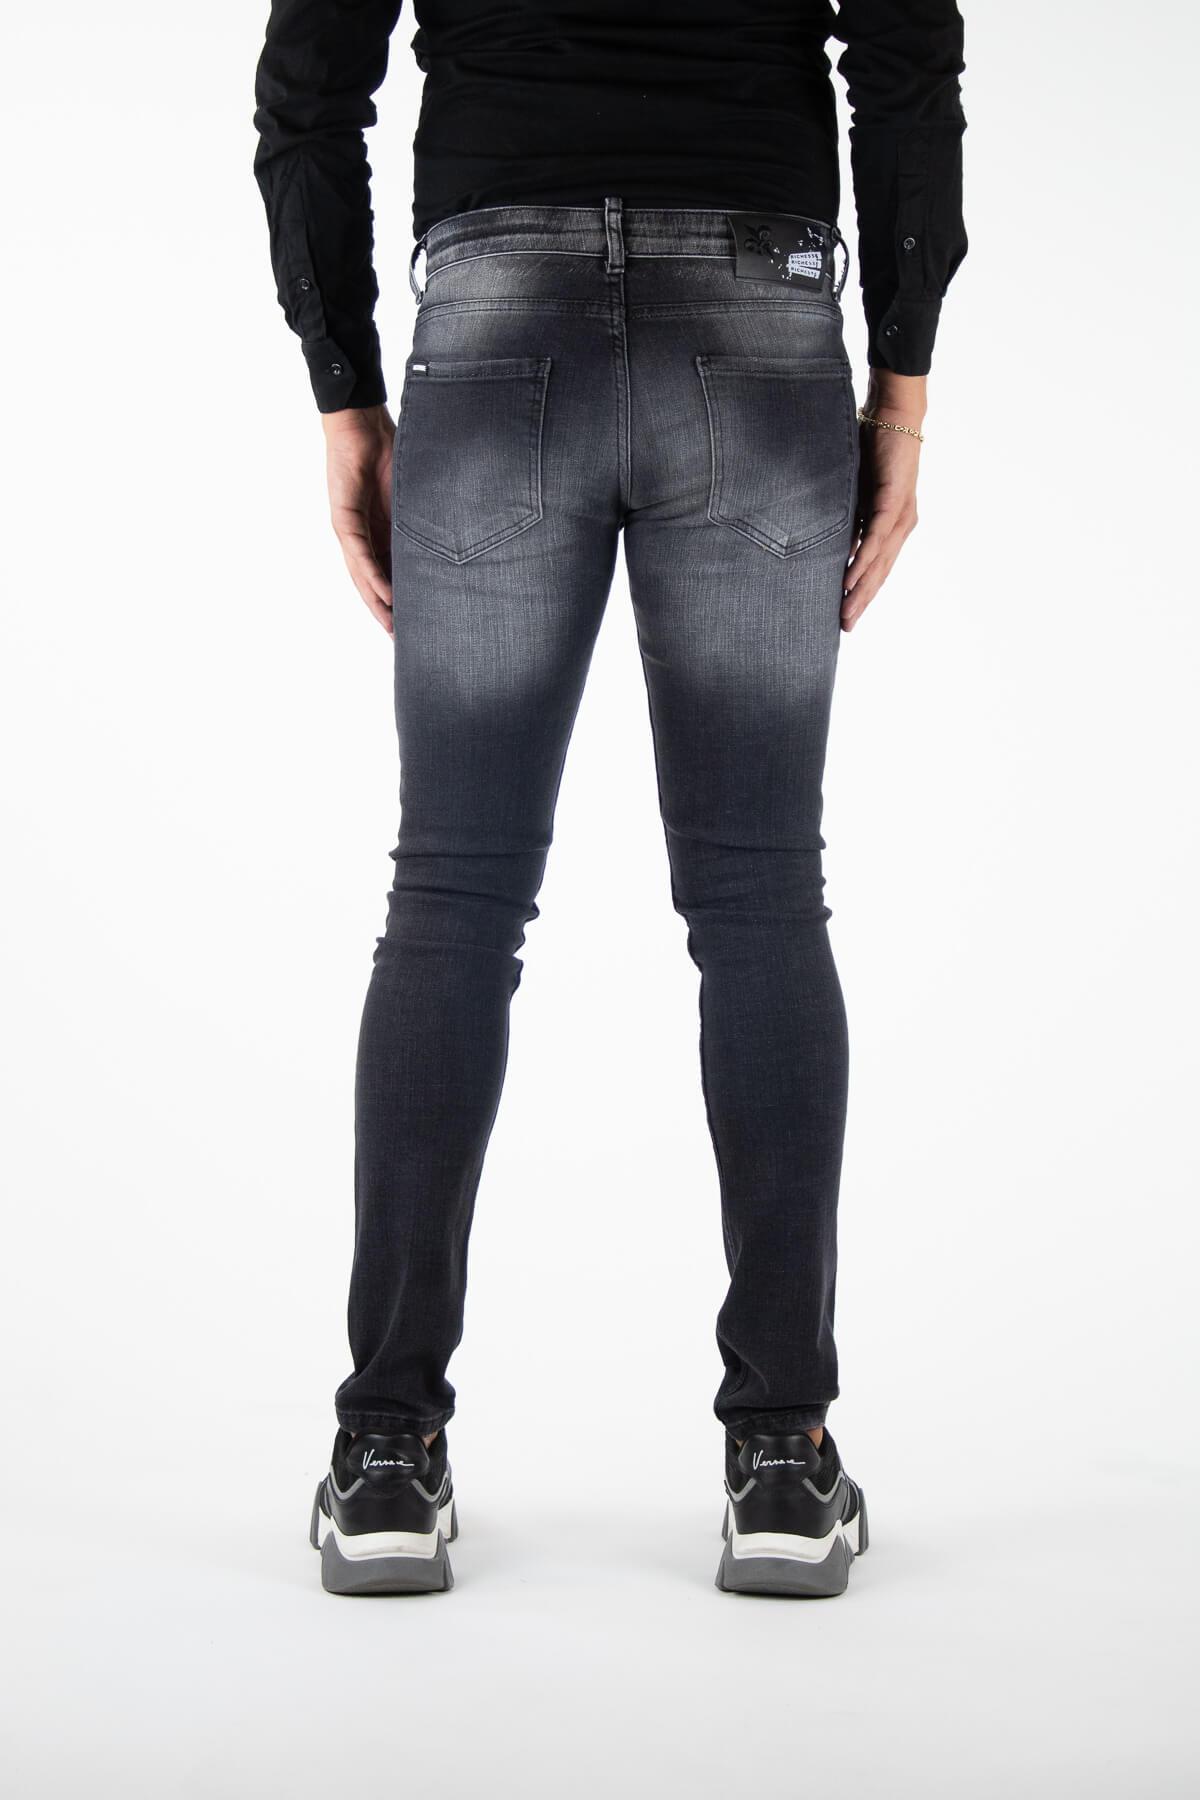 Porto Dark Jeans-4